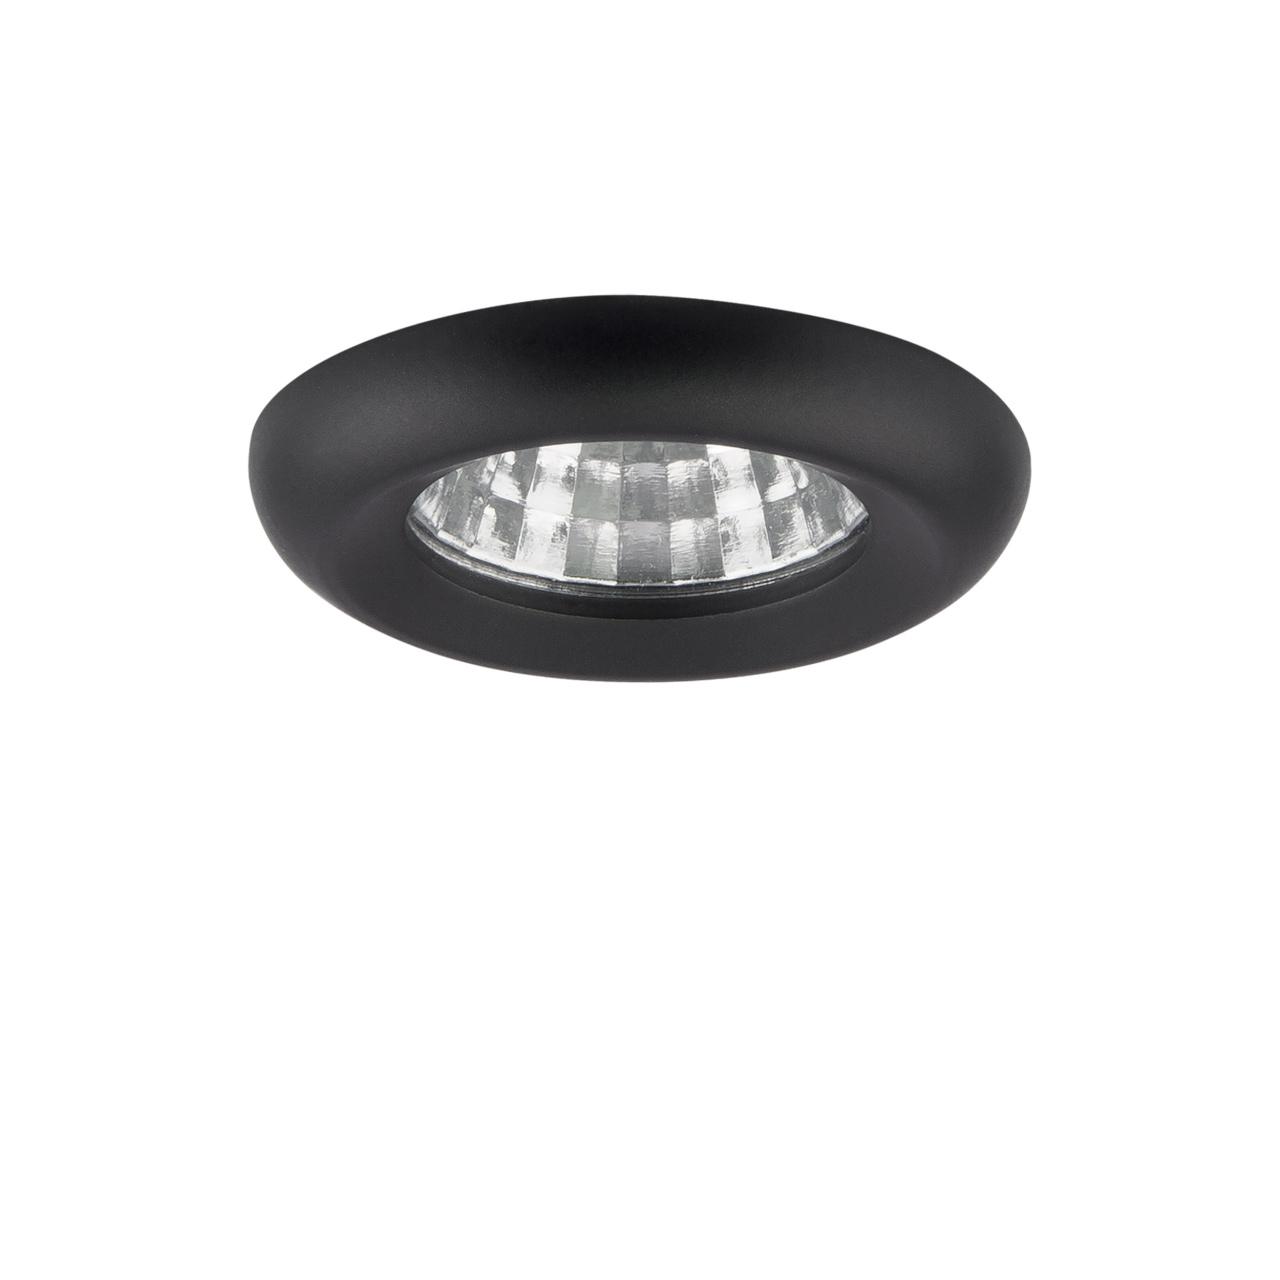 Светильник Monde LED 1W 80LM 18G черный 3000K Lightstar 071017